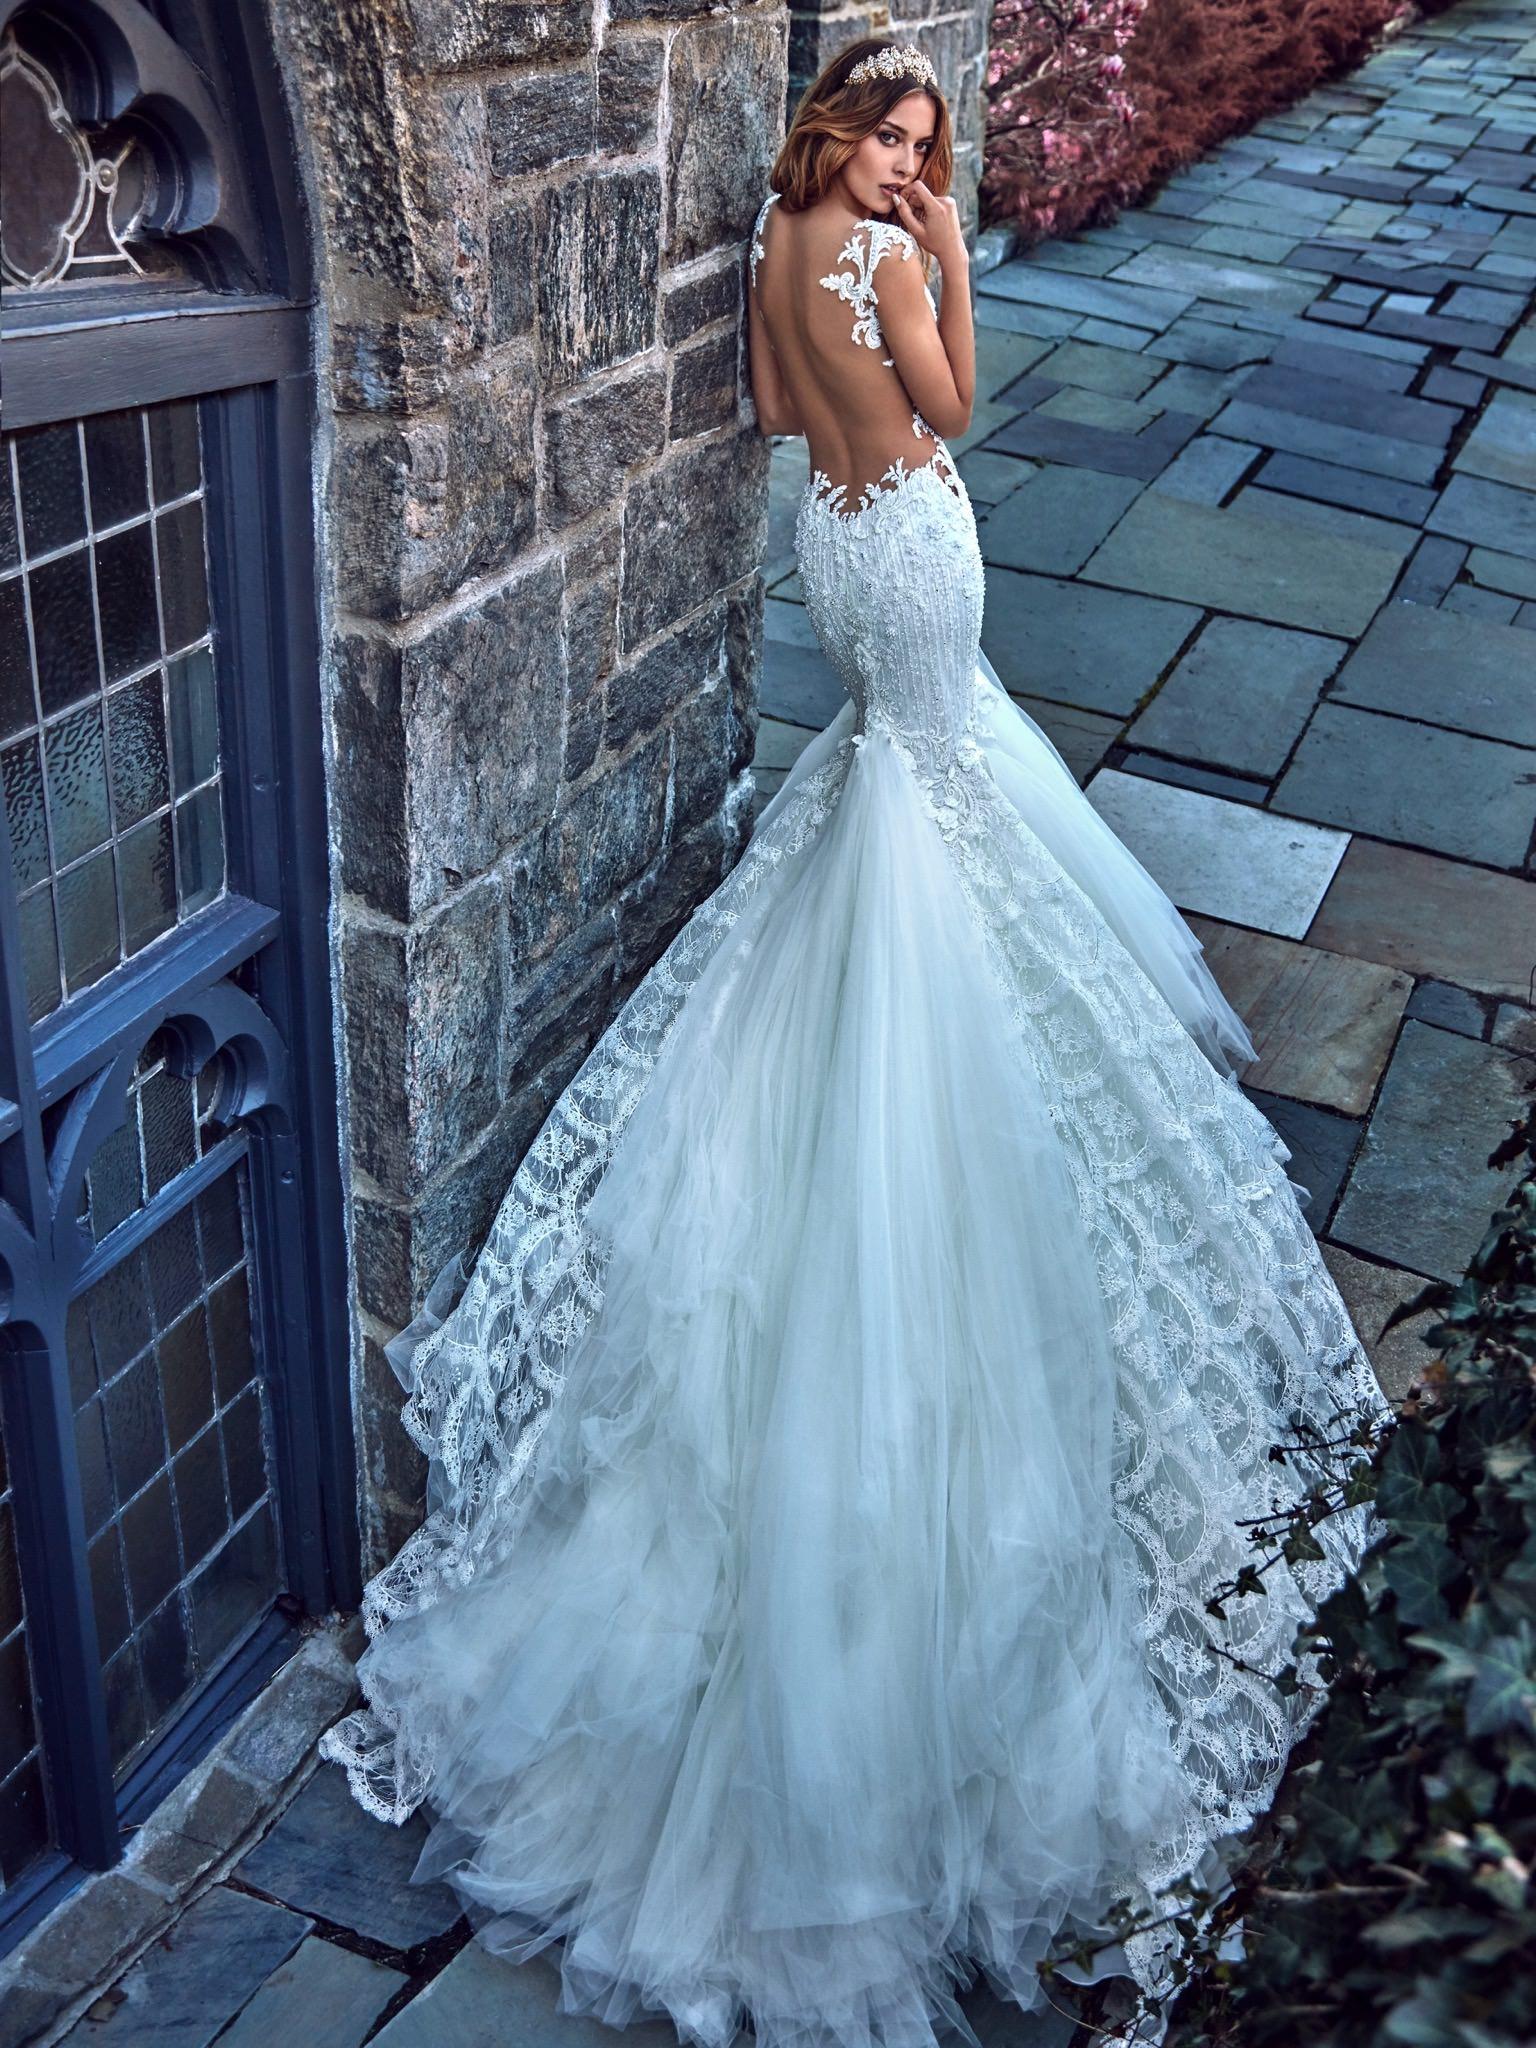 SAMPLE SALE - Browns Bride